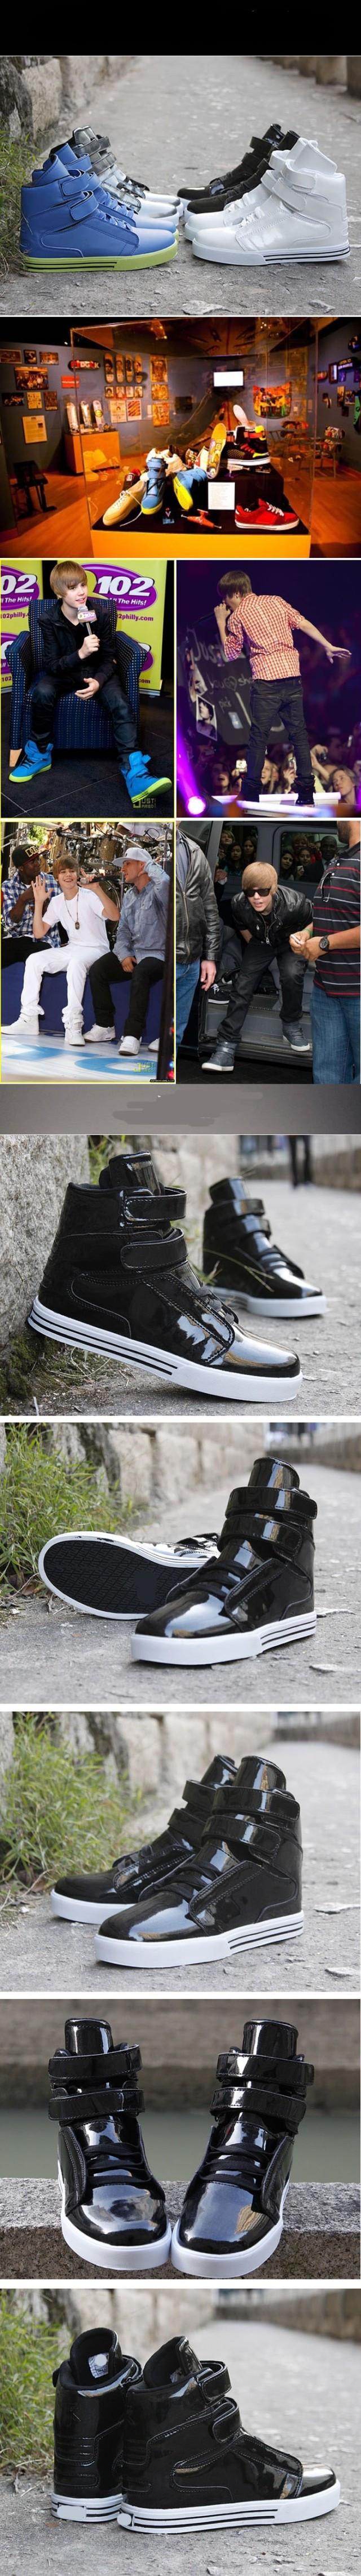 Мужские кроссовки sneaker s51